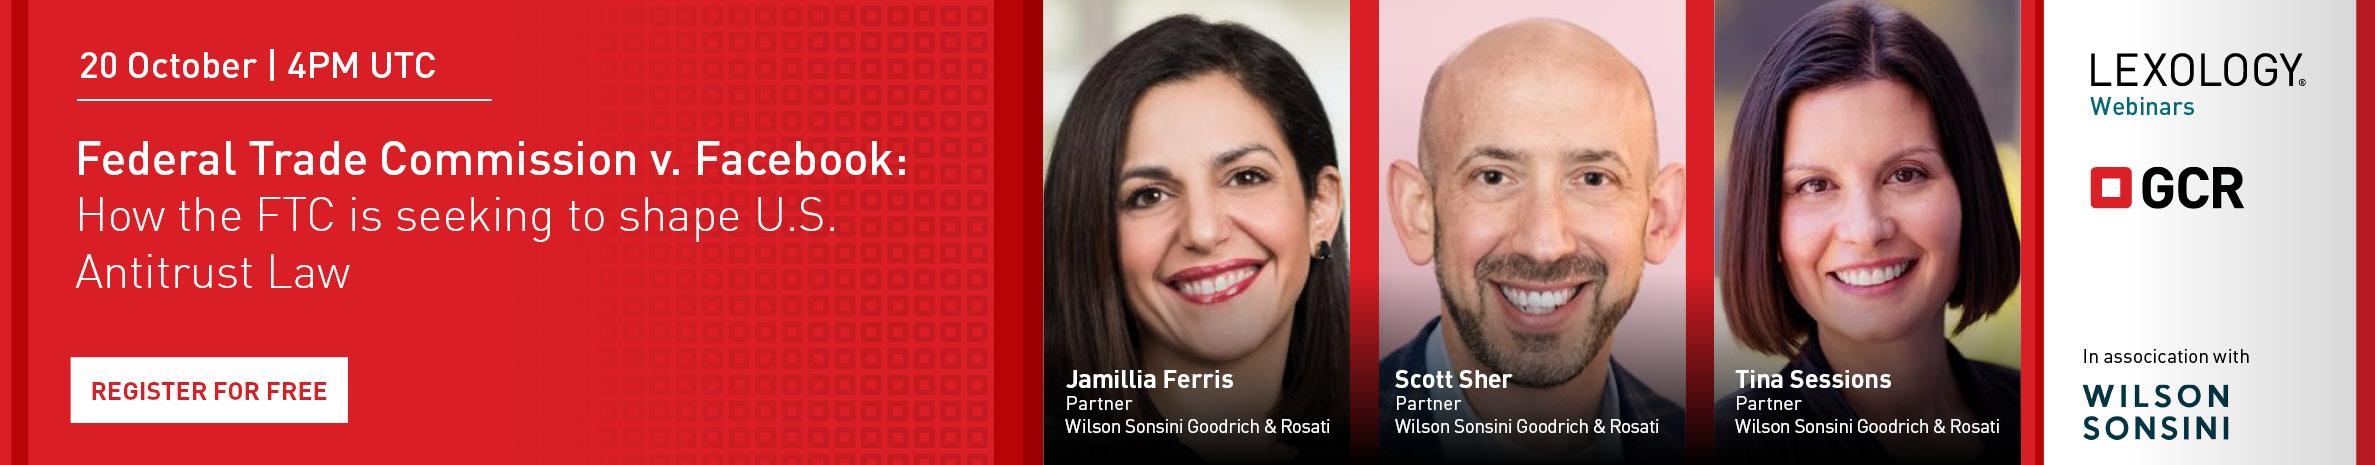 Wilson Sonsini Goodrich & Rosati Webinar, 20 October, 4pm UTC